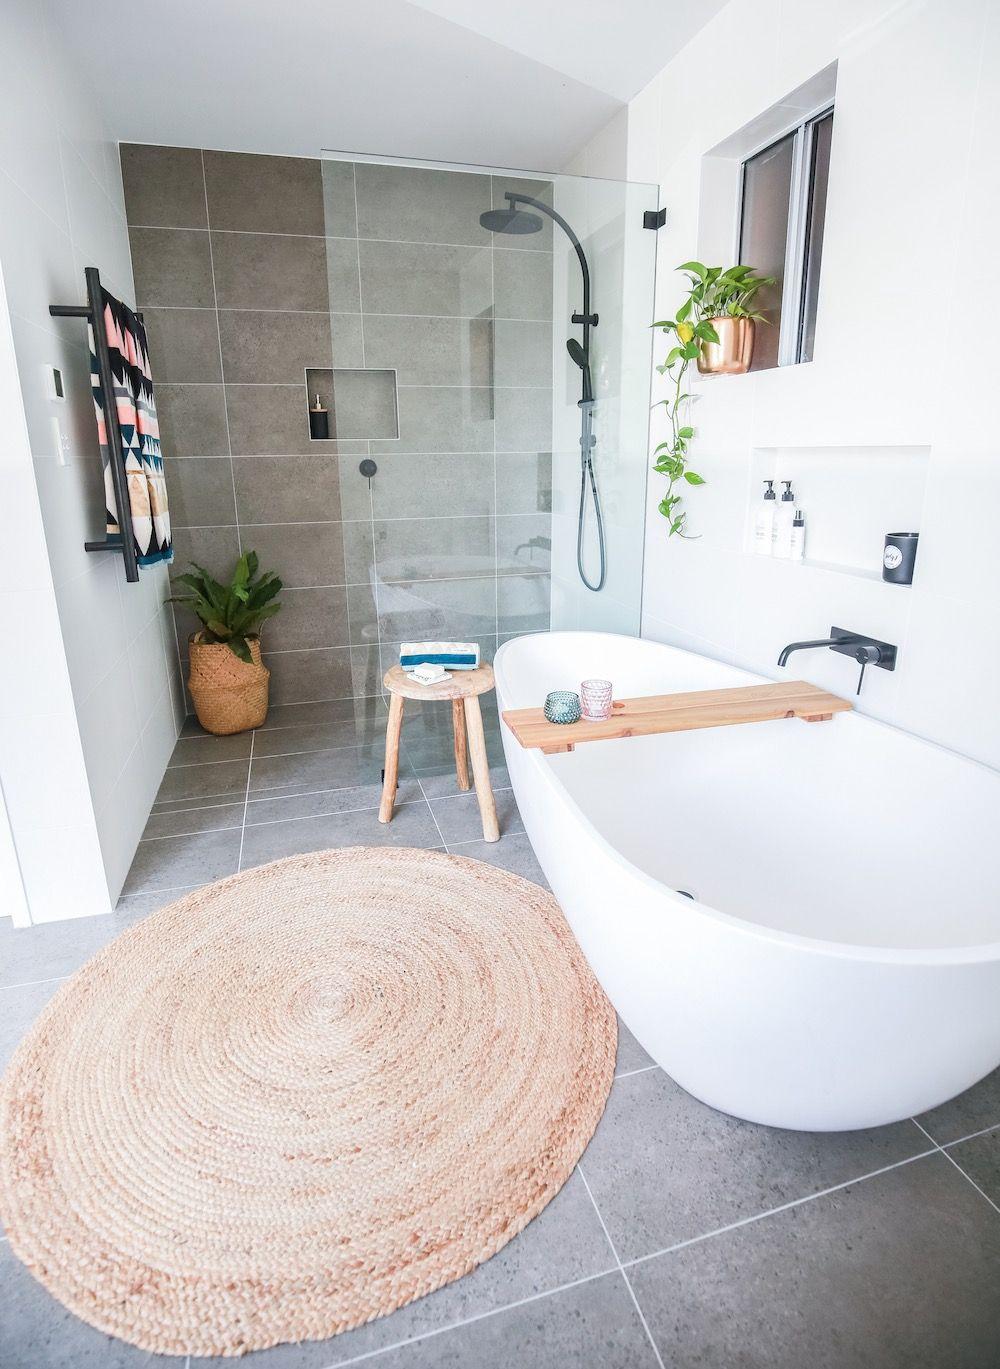 Salle De Bain Du Futur ~ house call warning shelley s home will likely cause bathroom envy